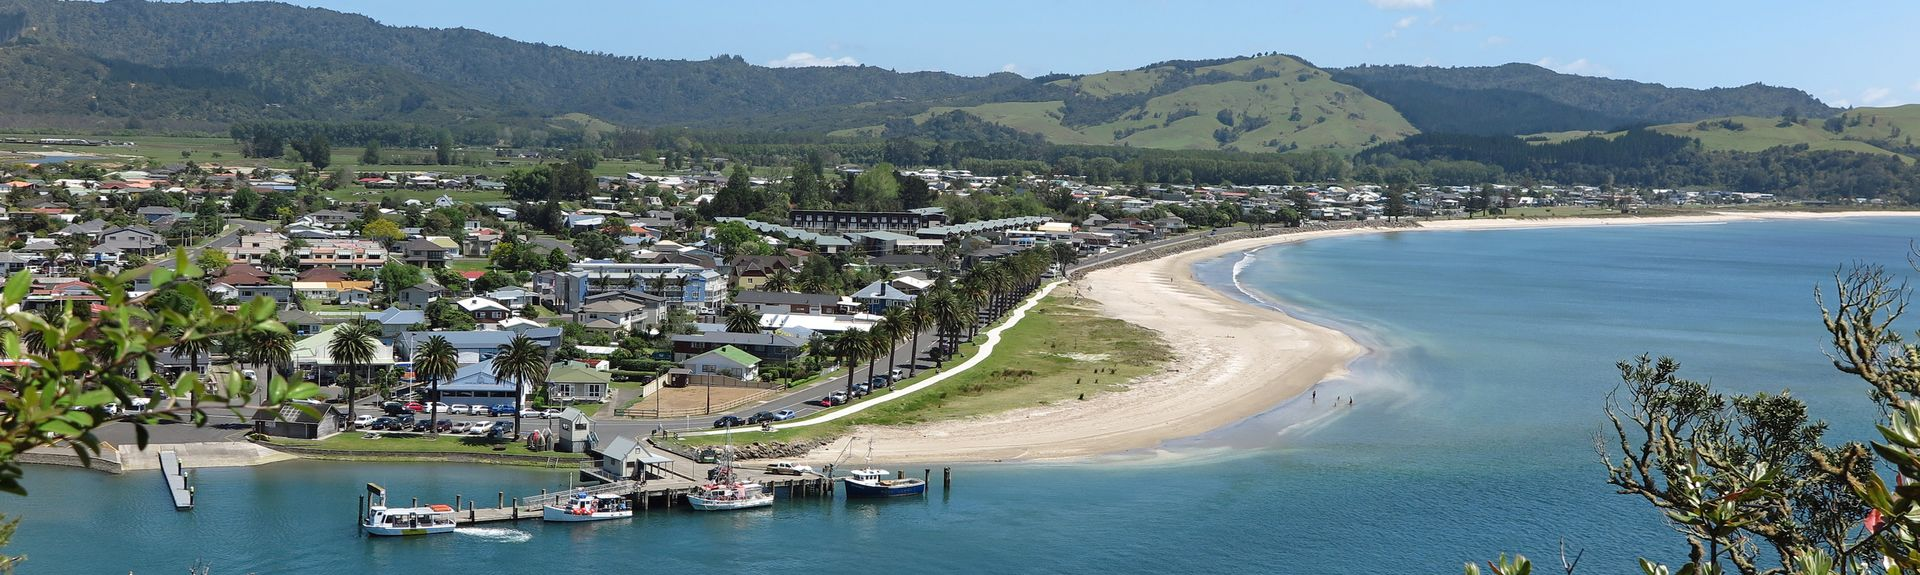 Coromandel Peninsula, Waikato, New Zealand